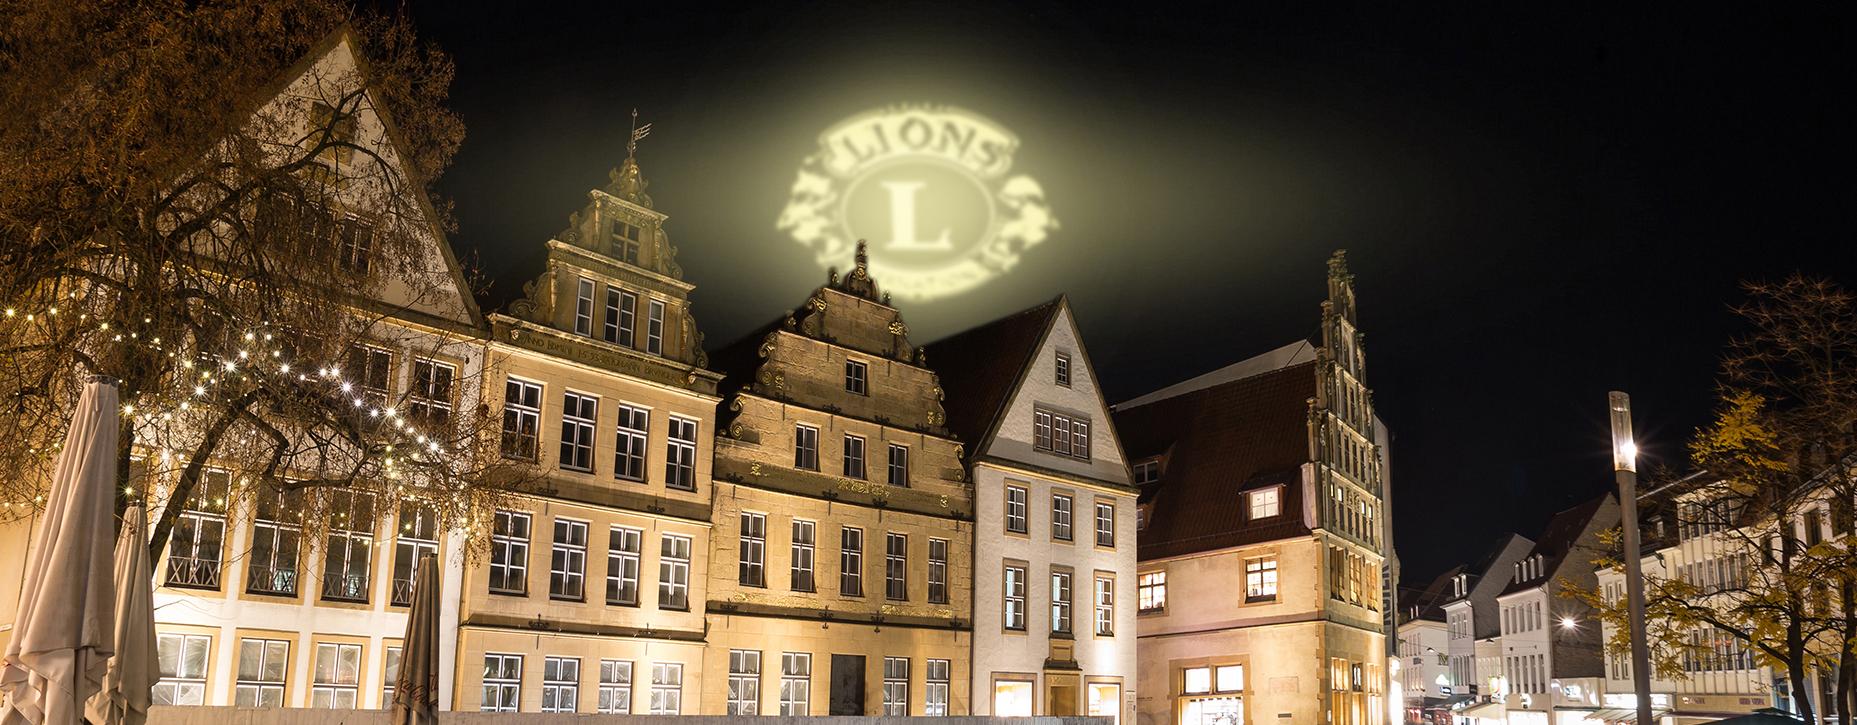 Lions Club Bielefeld